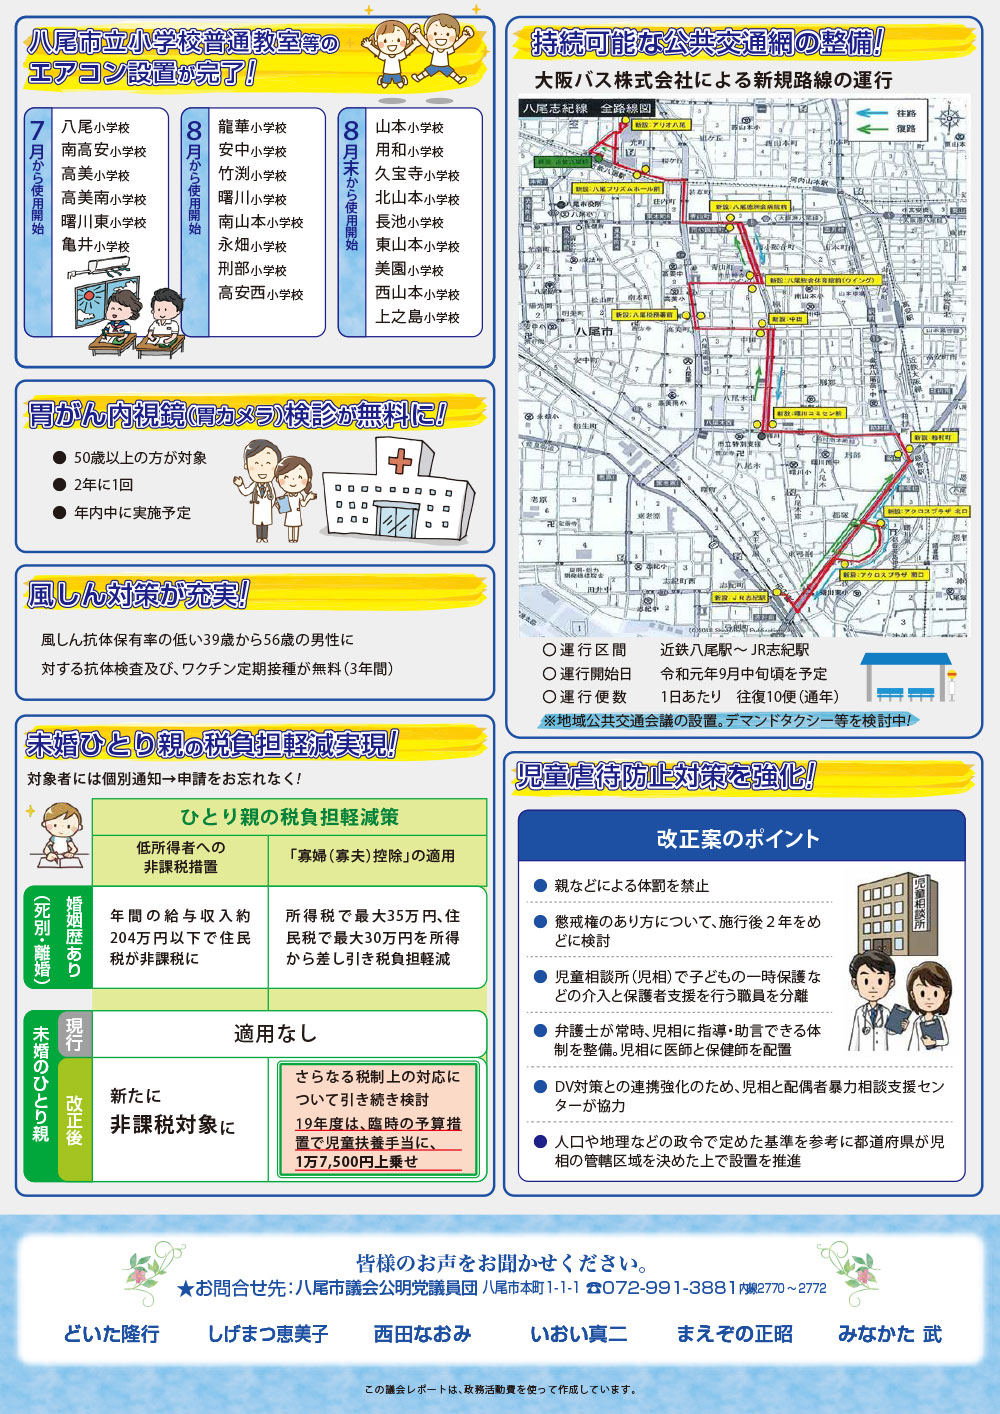 八尾市議会公明党議会レポート(2019年)2